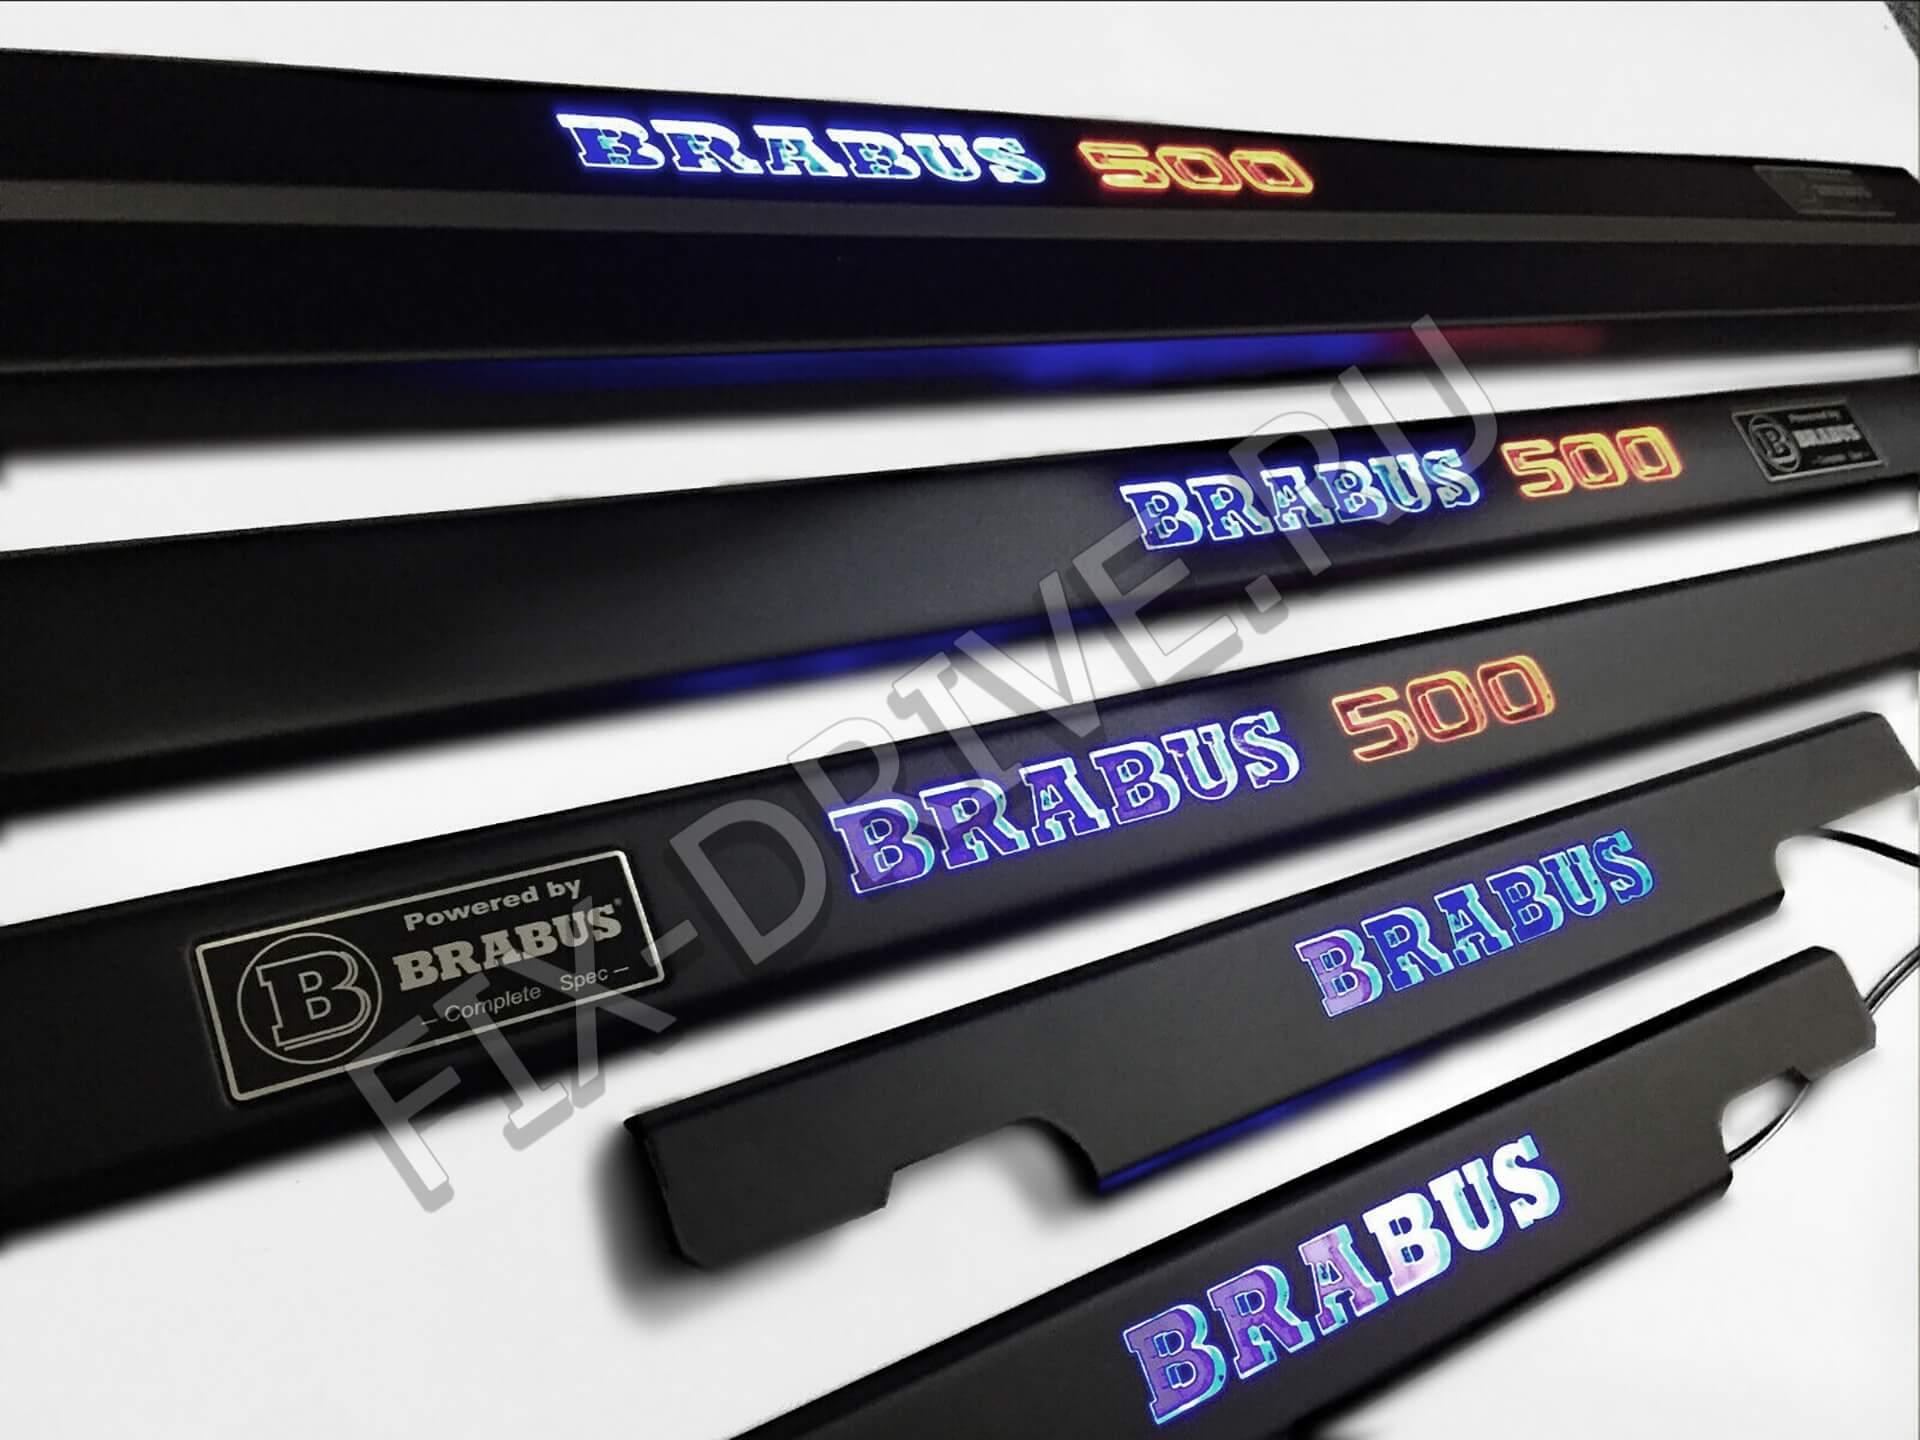 Пороги Brabus 500 w463 накладки подсветка гелик